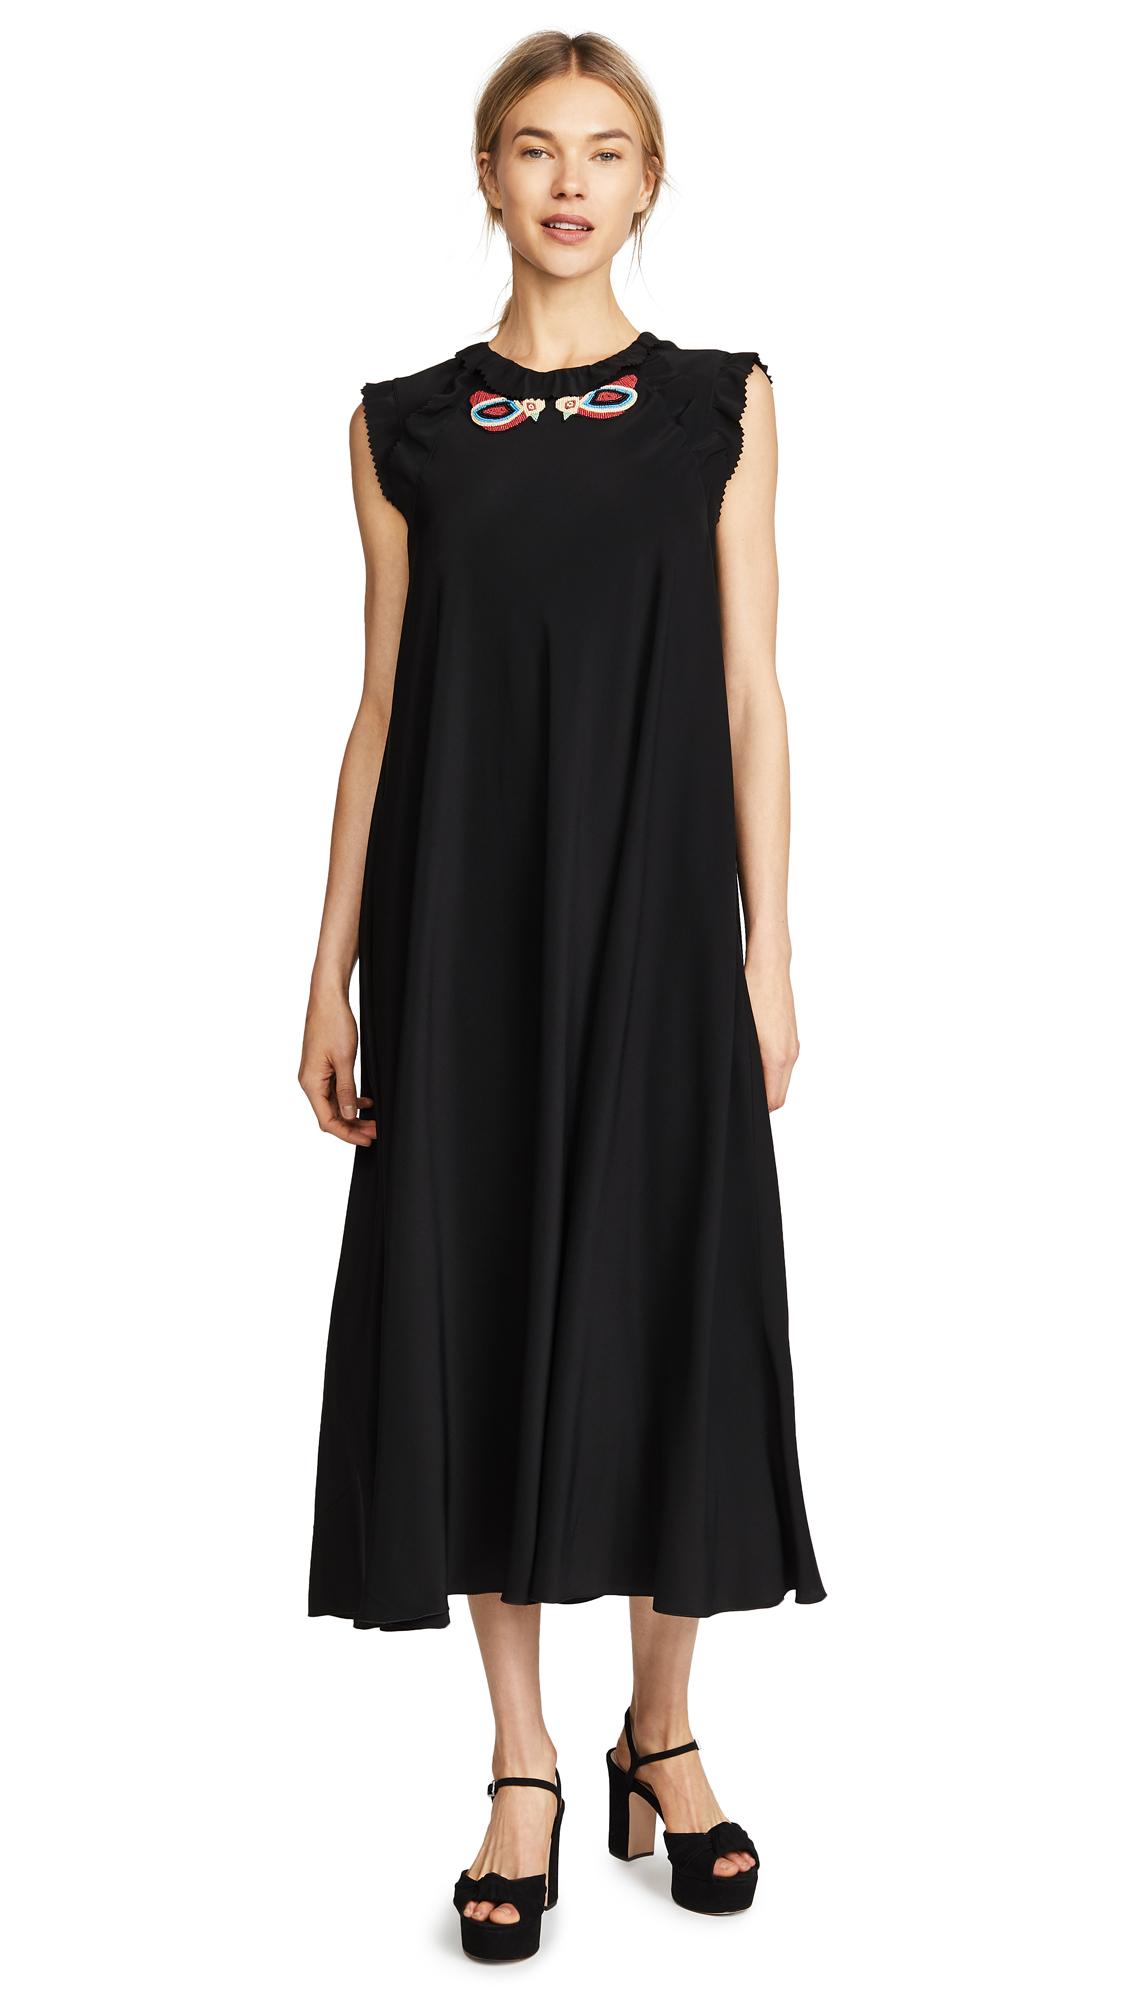 RED Valentino Black Midi Dress